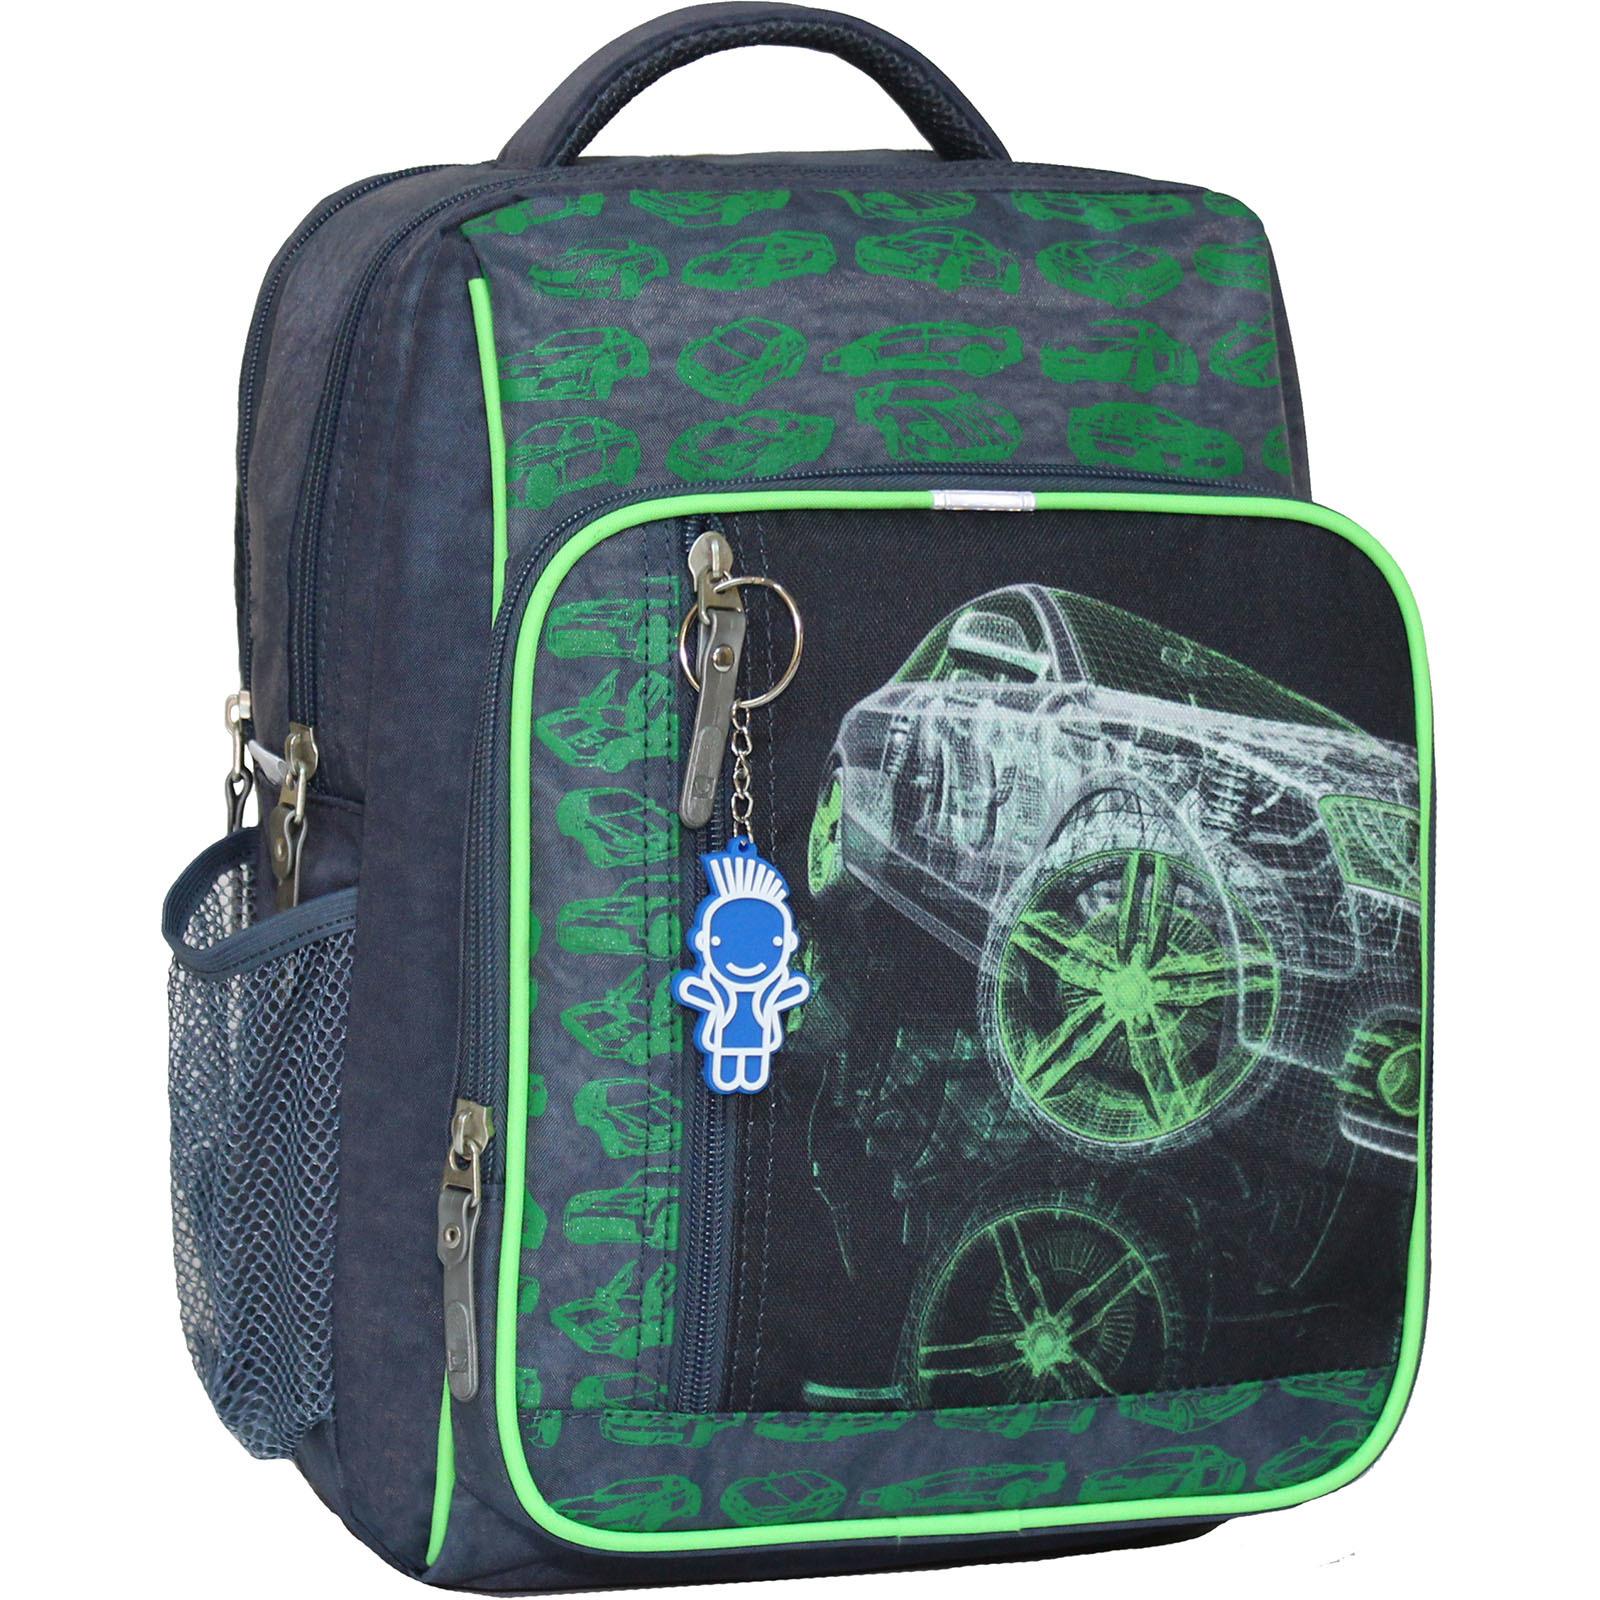 Школьные рюкзаки Рюкзак школьный Bagland Школьник 8 л. Серый (машина 16) (00112702) IMG_8203_атр16М_.JPG